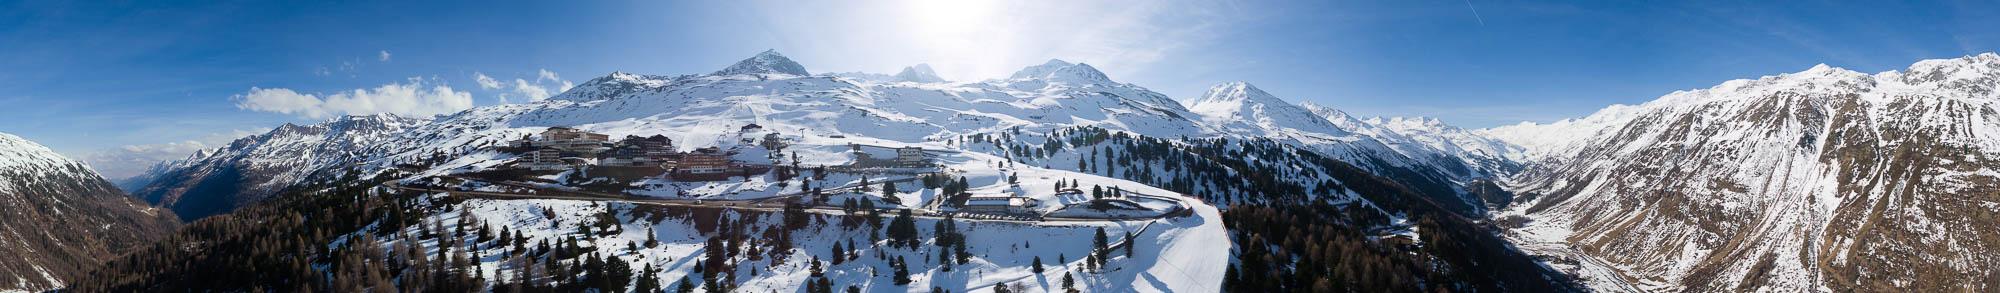 Sölden Winter Panoramas - www.jusmedic.com